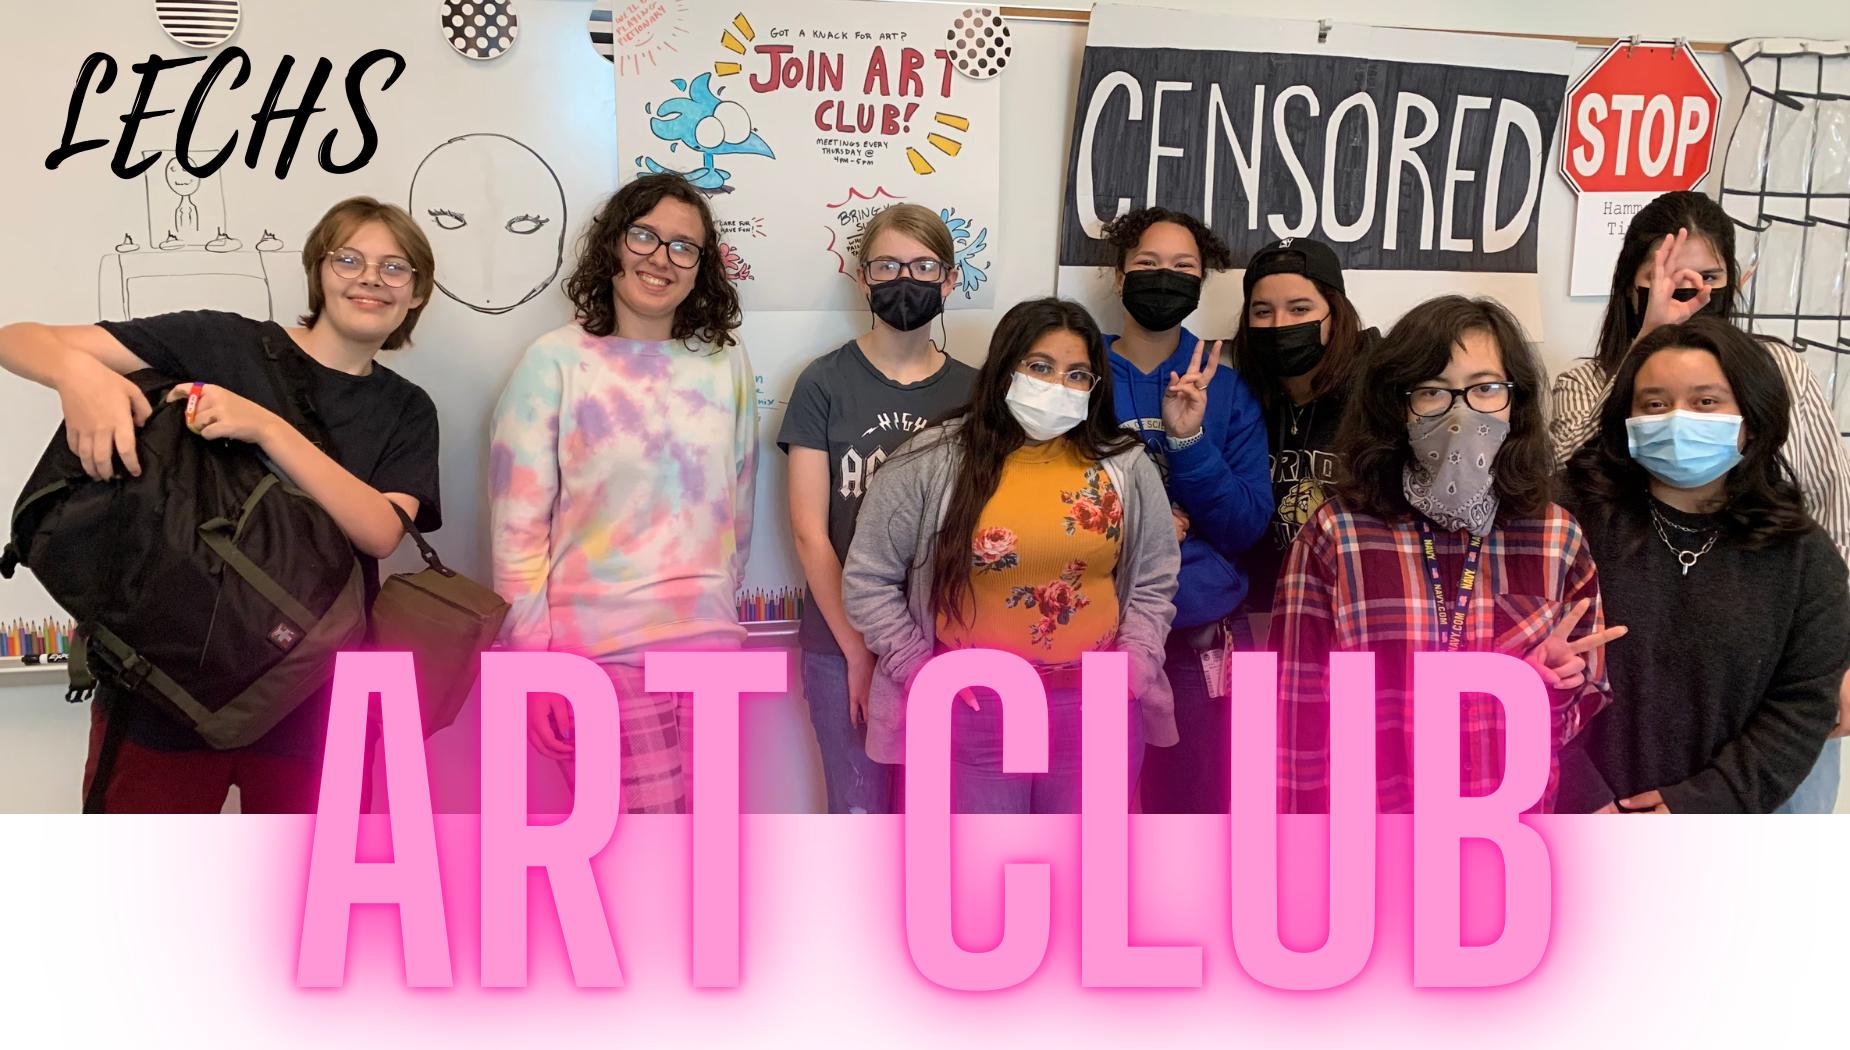 LECHS Art Club